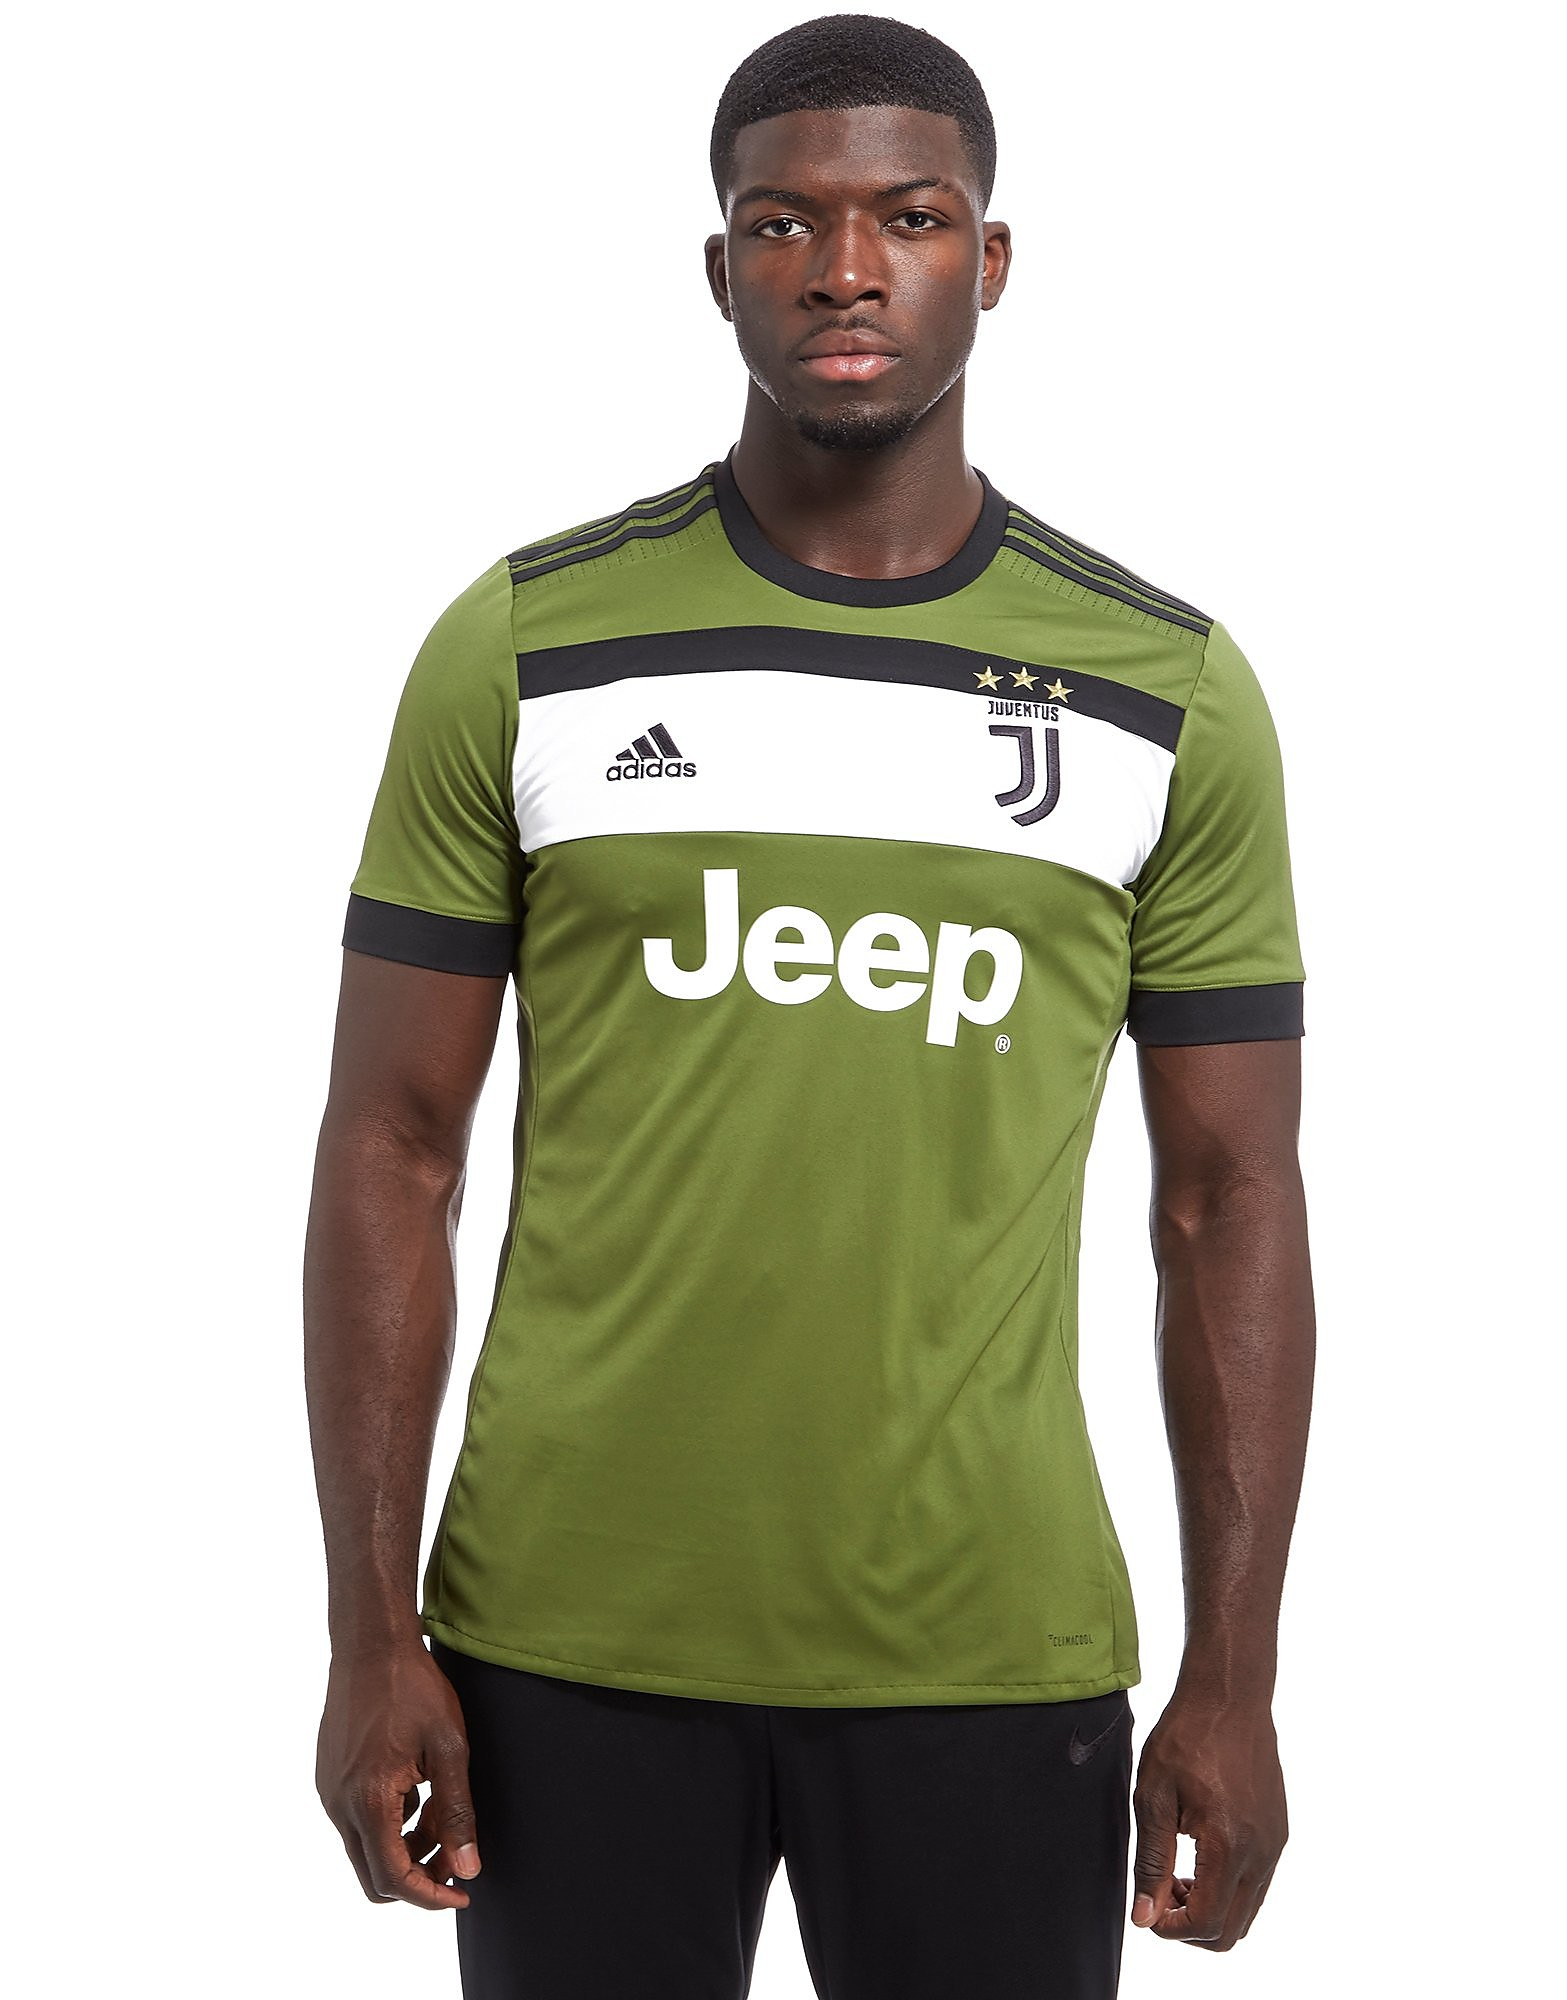 adidas Juventus 2017/18 Terza Maglia